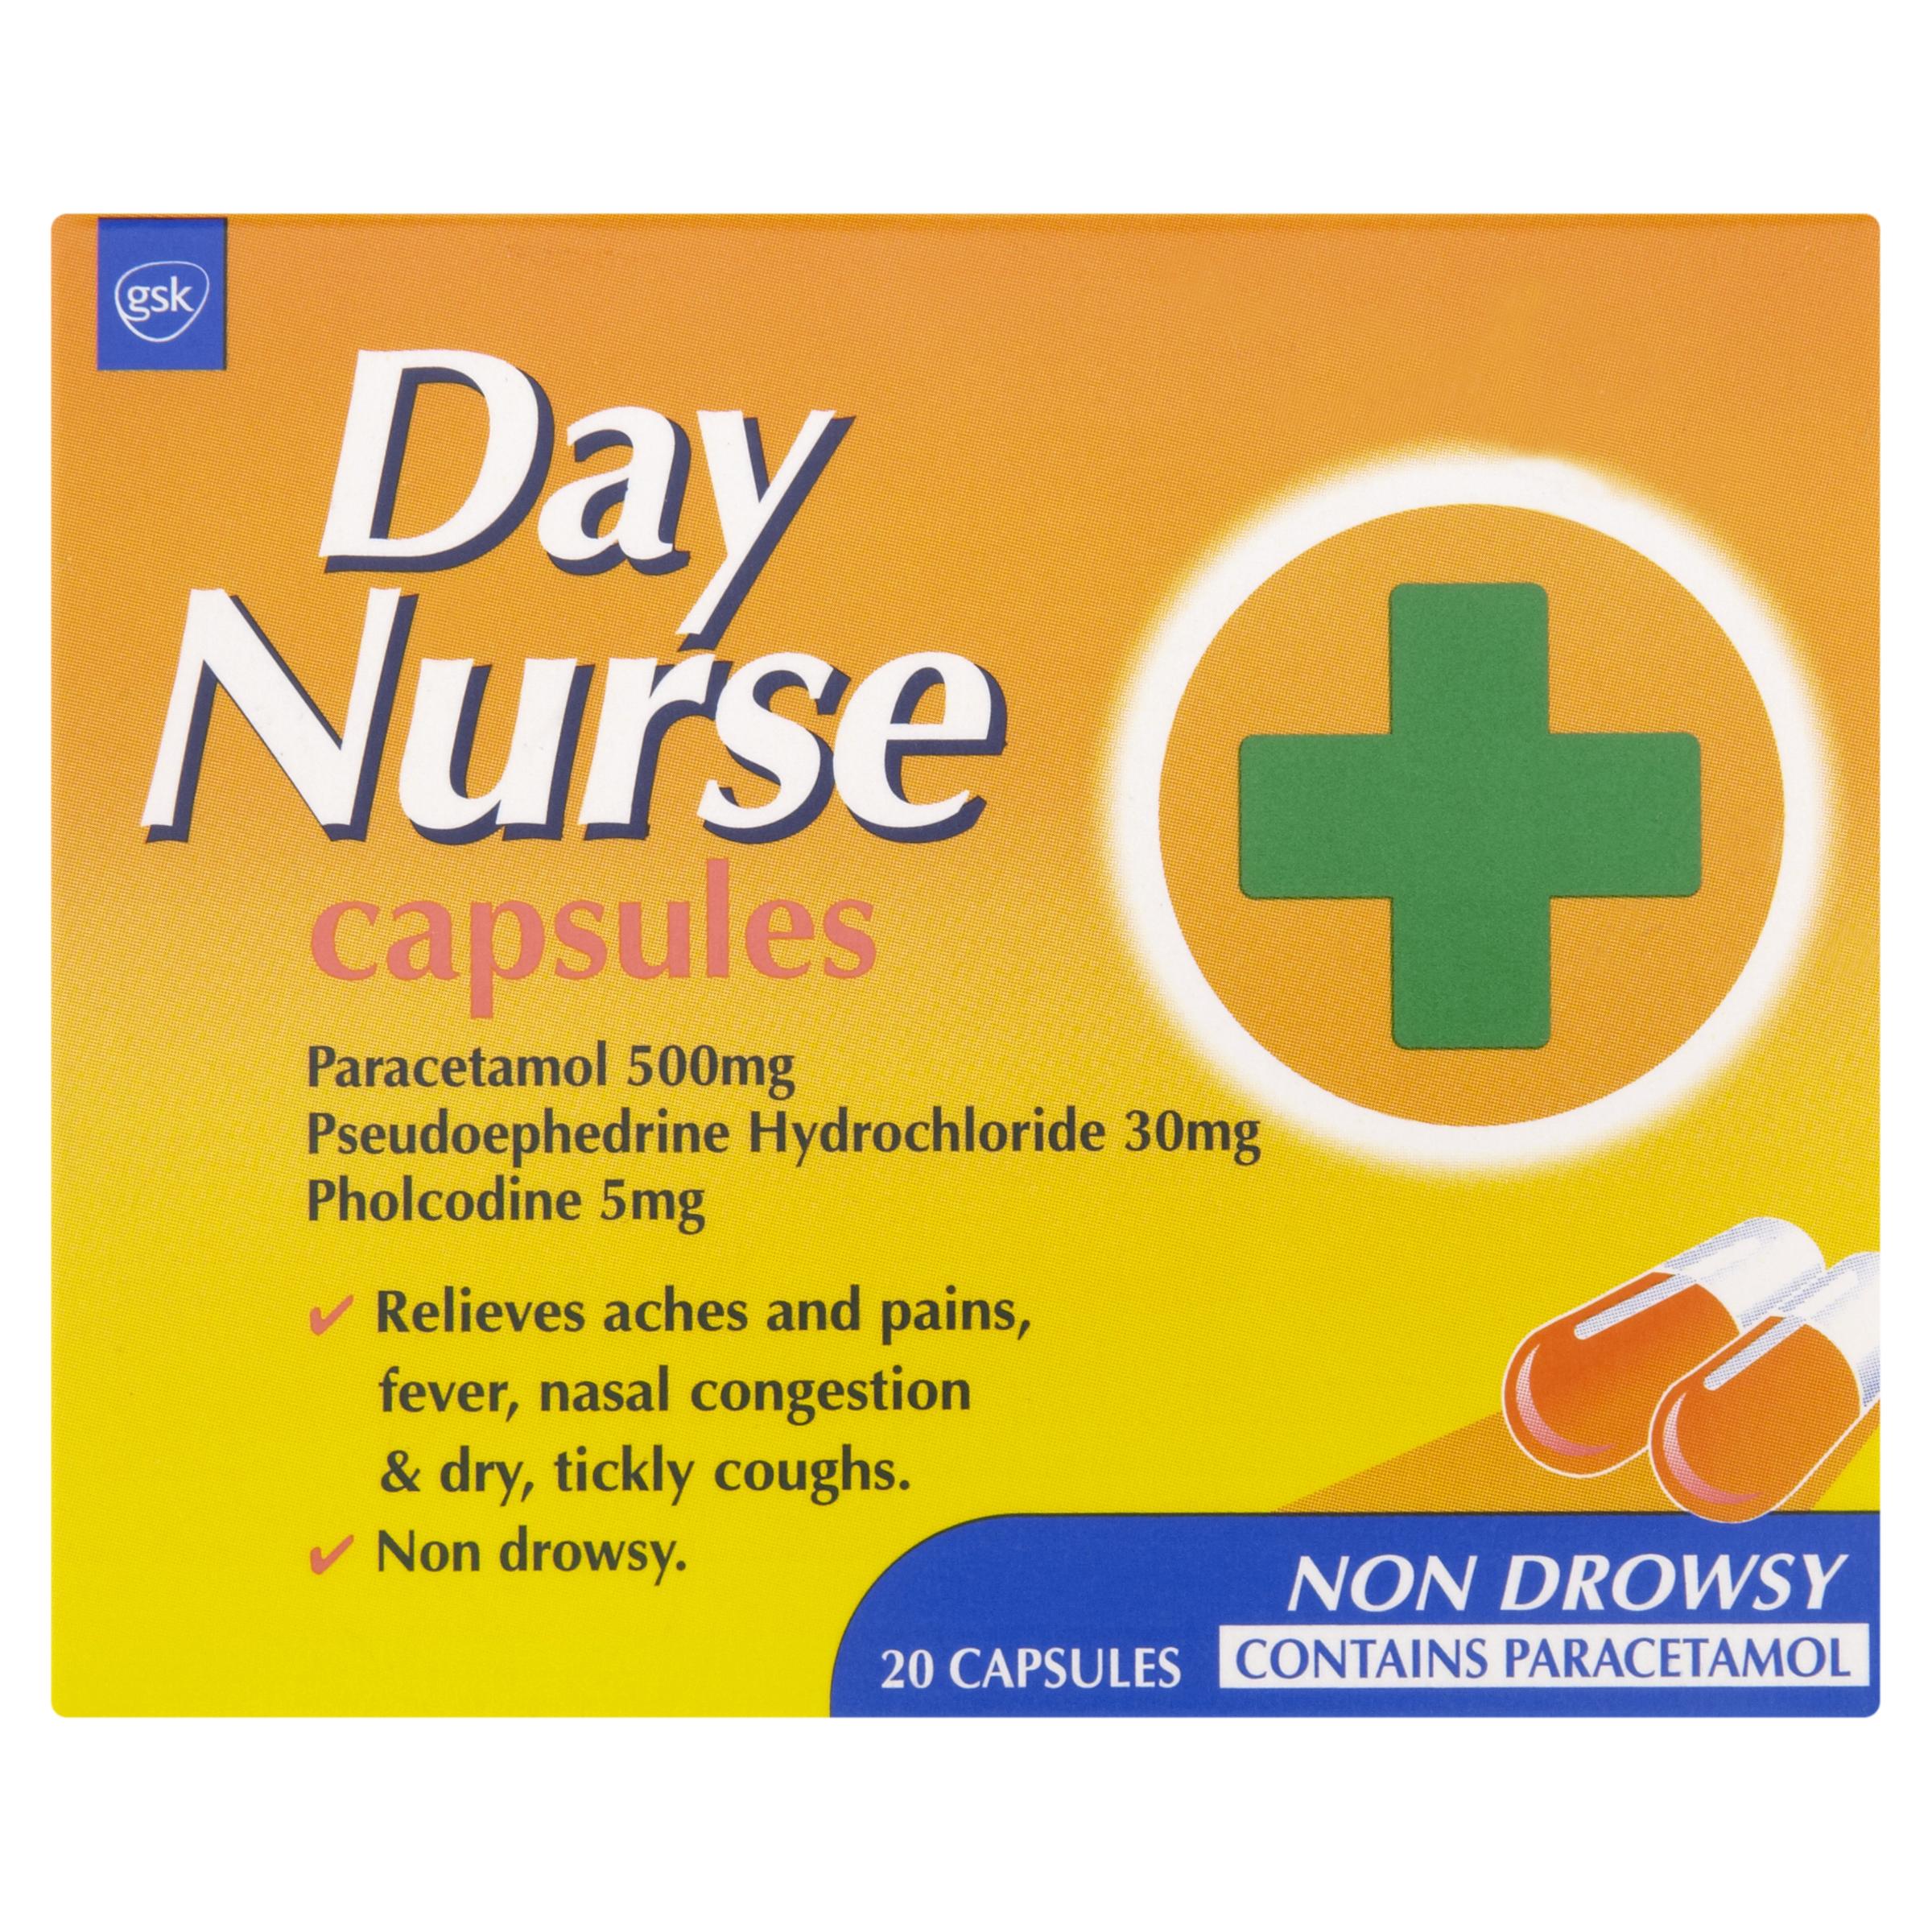 daynursecapsules.png